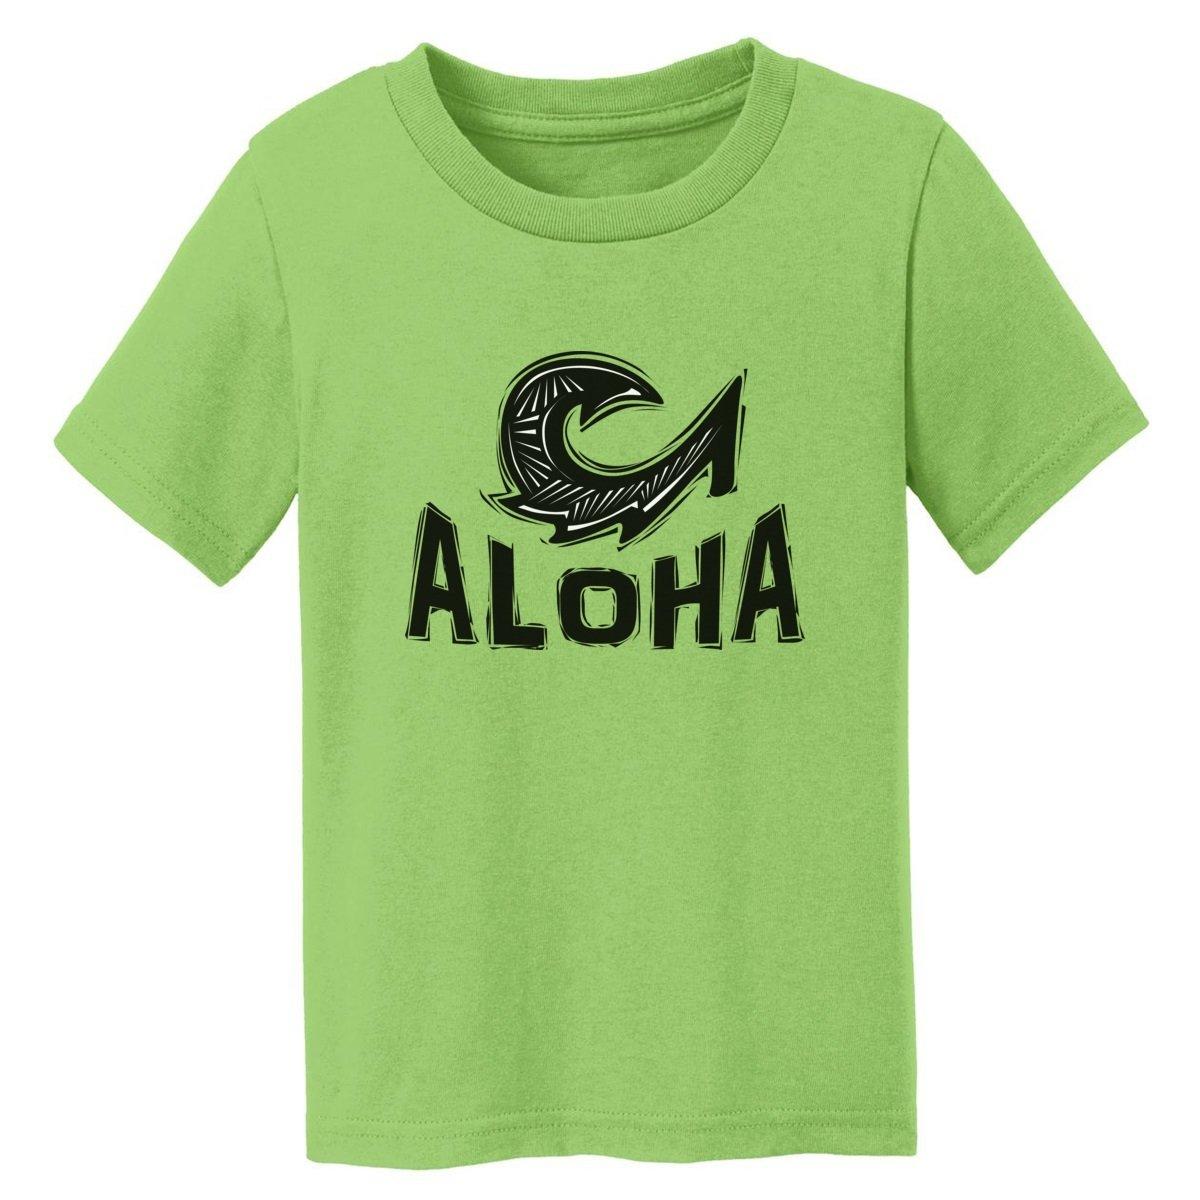 Digital T-Shirt Shop Baby-boys Aloha Maui Fish Hook T-Shirt 2T LIME GREEN by Digital T-Shirt Shop (Image #1)